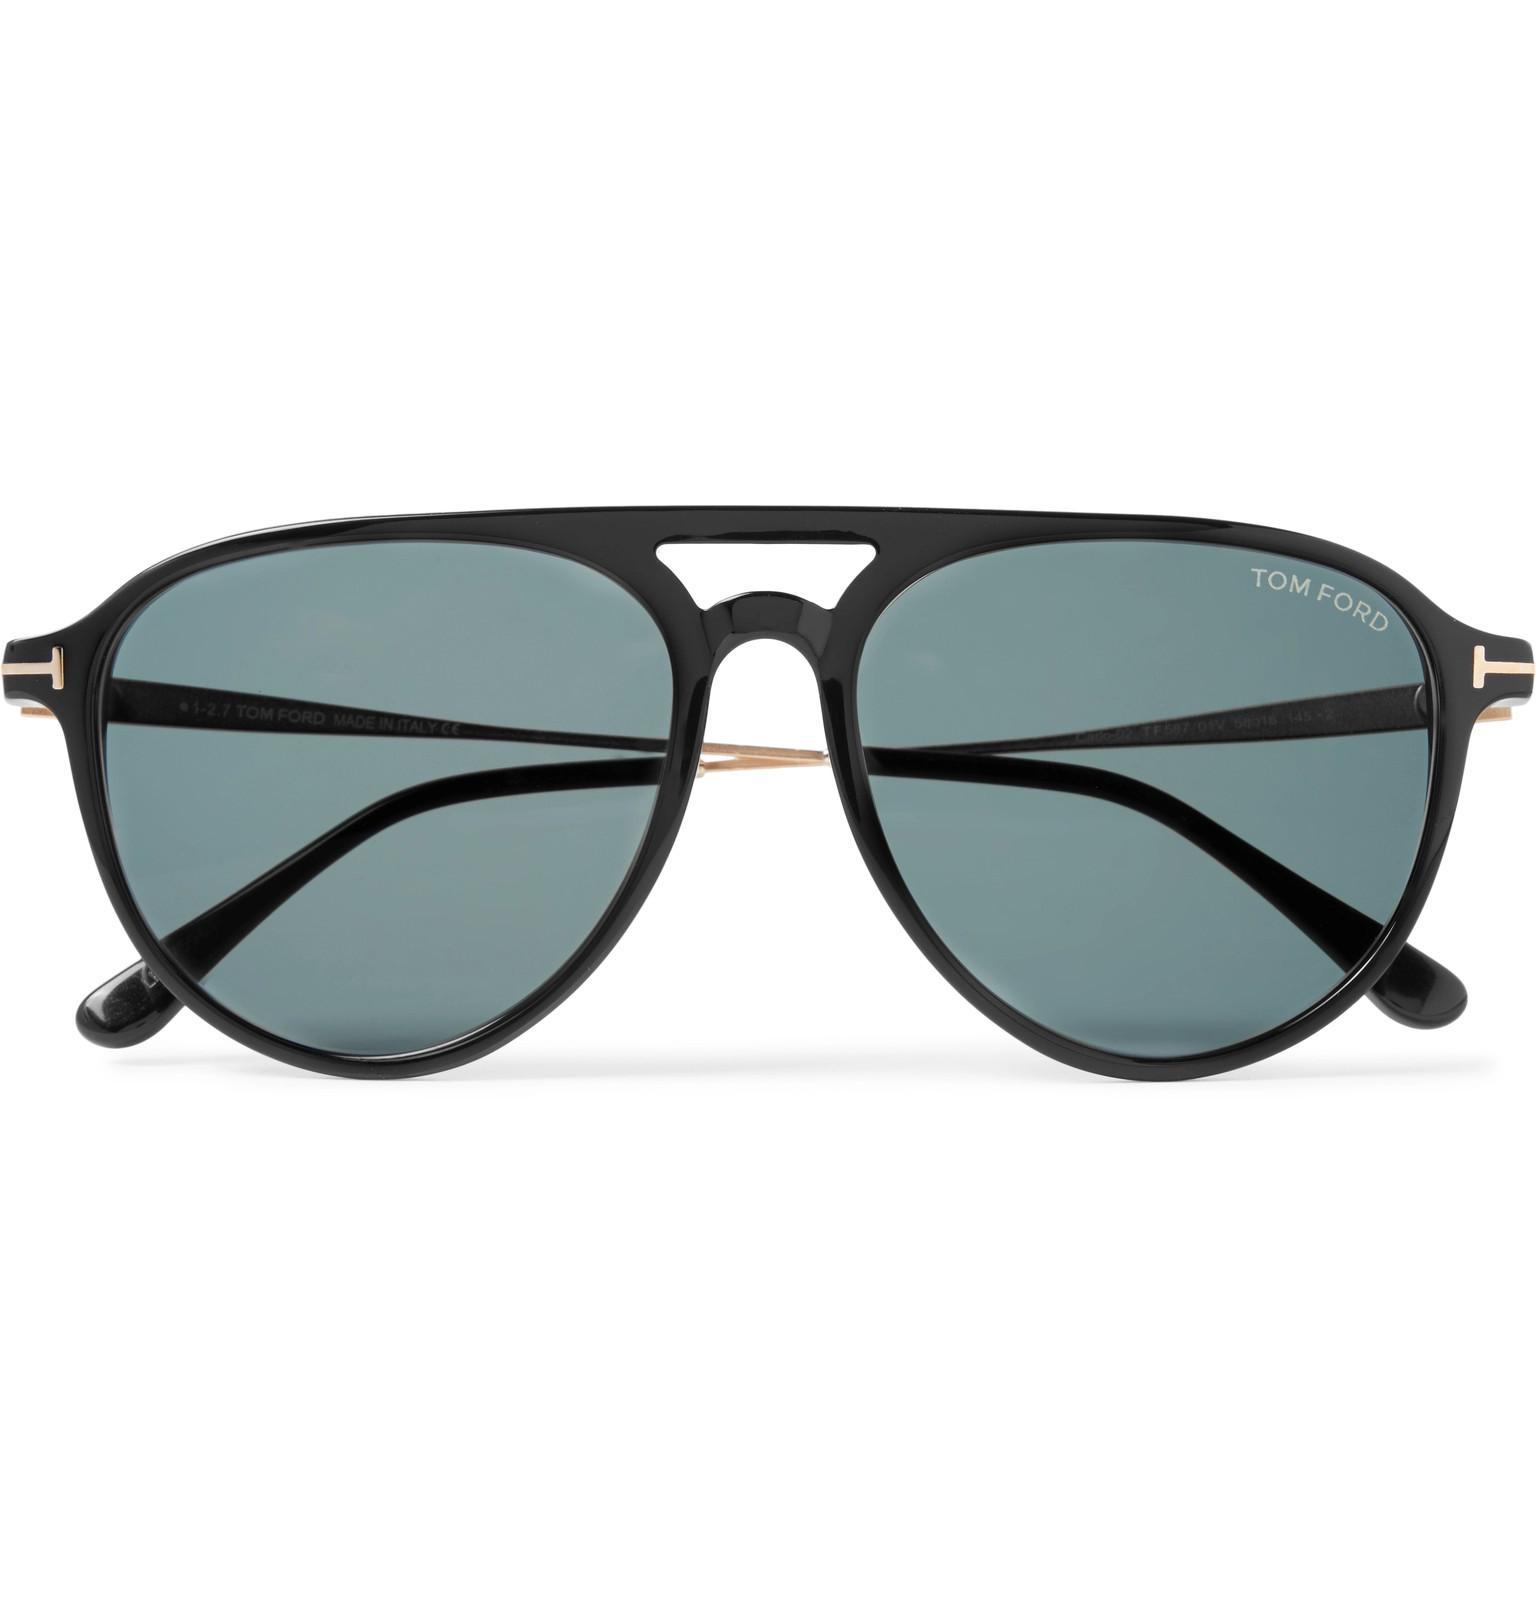 00f83e88f38d7 Tom Ford Carlo Aviator-style Acetate And Gold-tone Sunglasses in ...